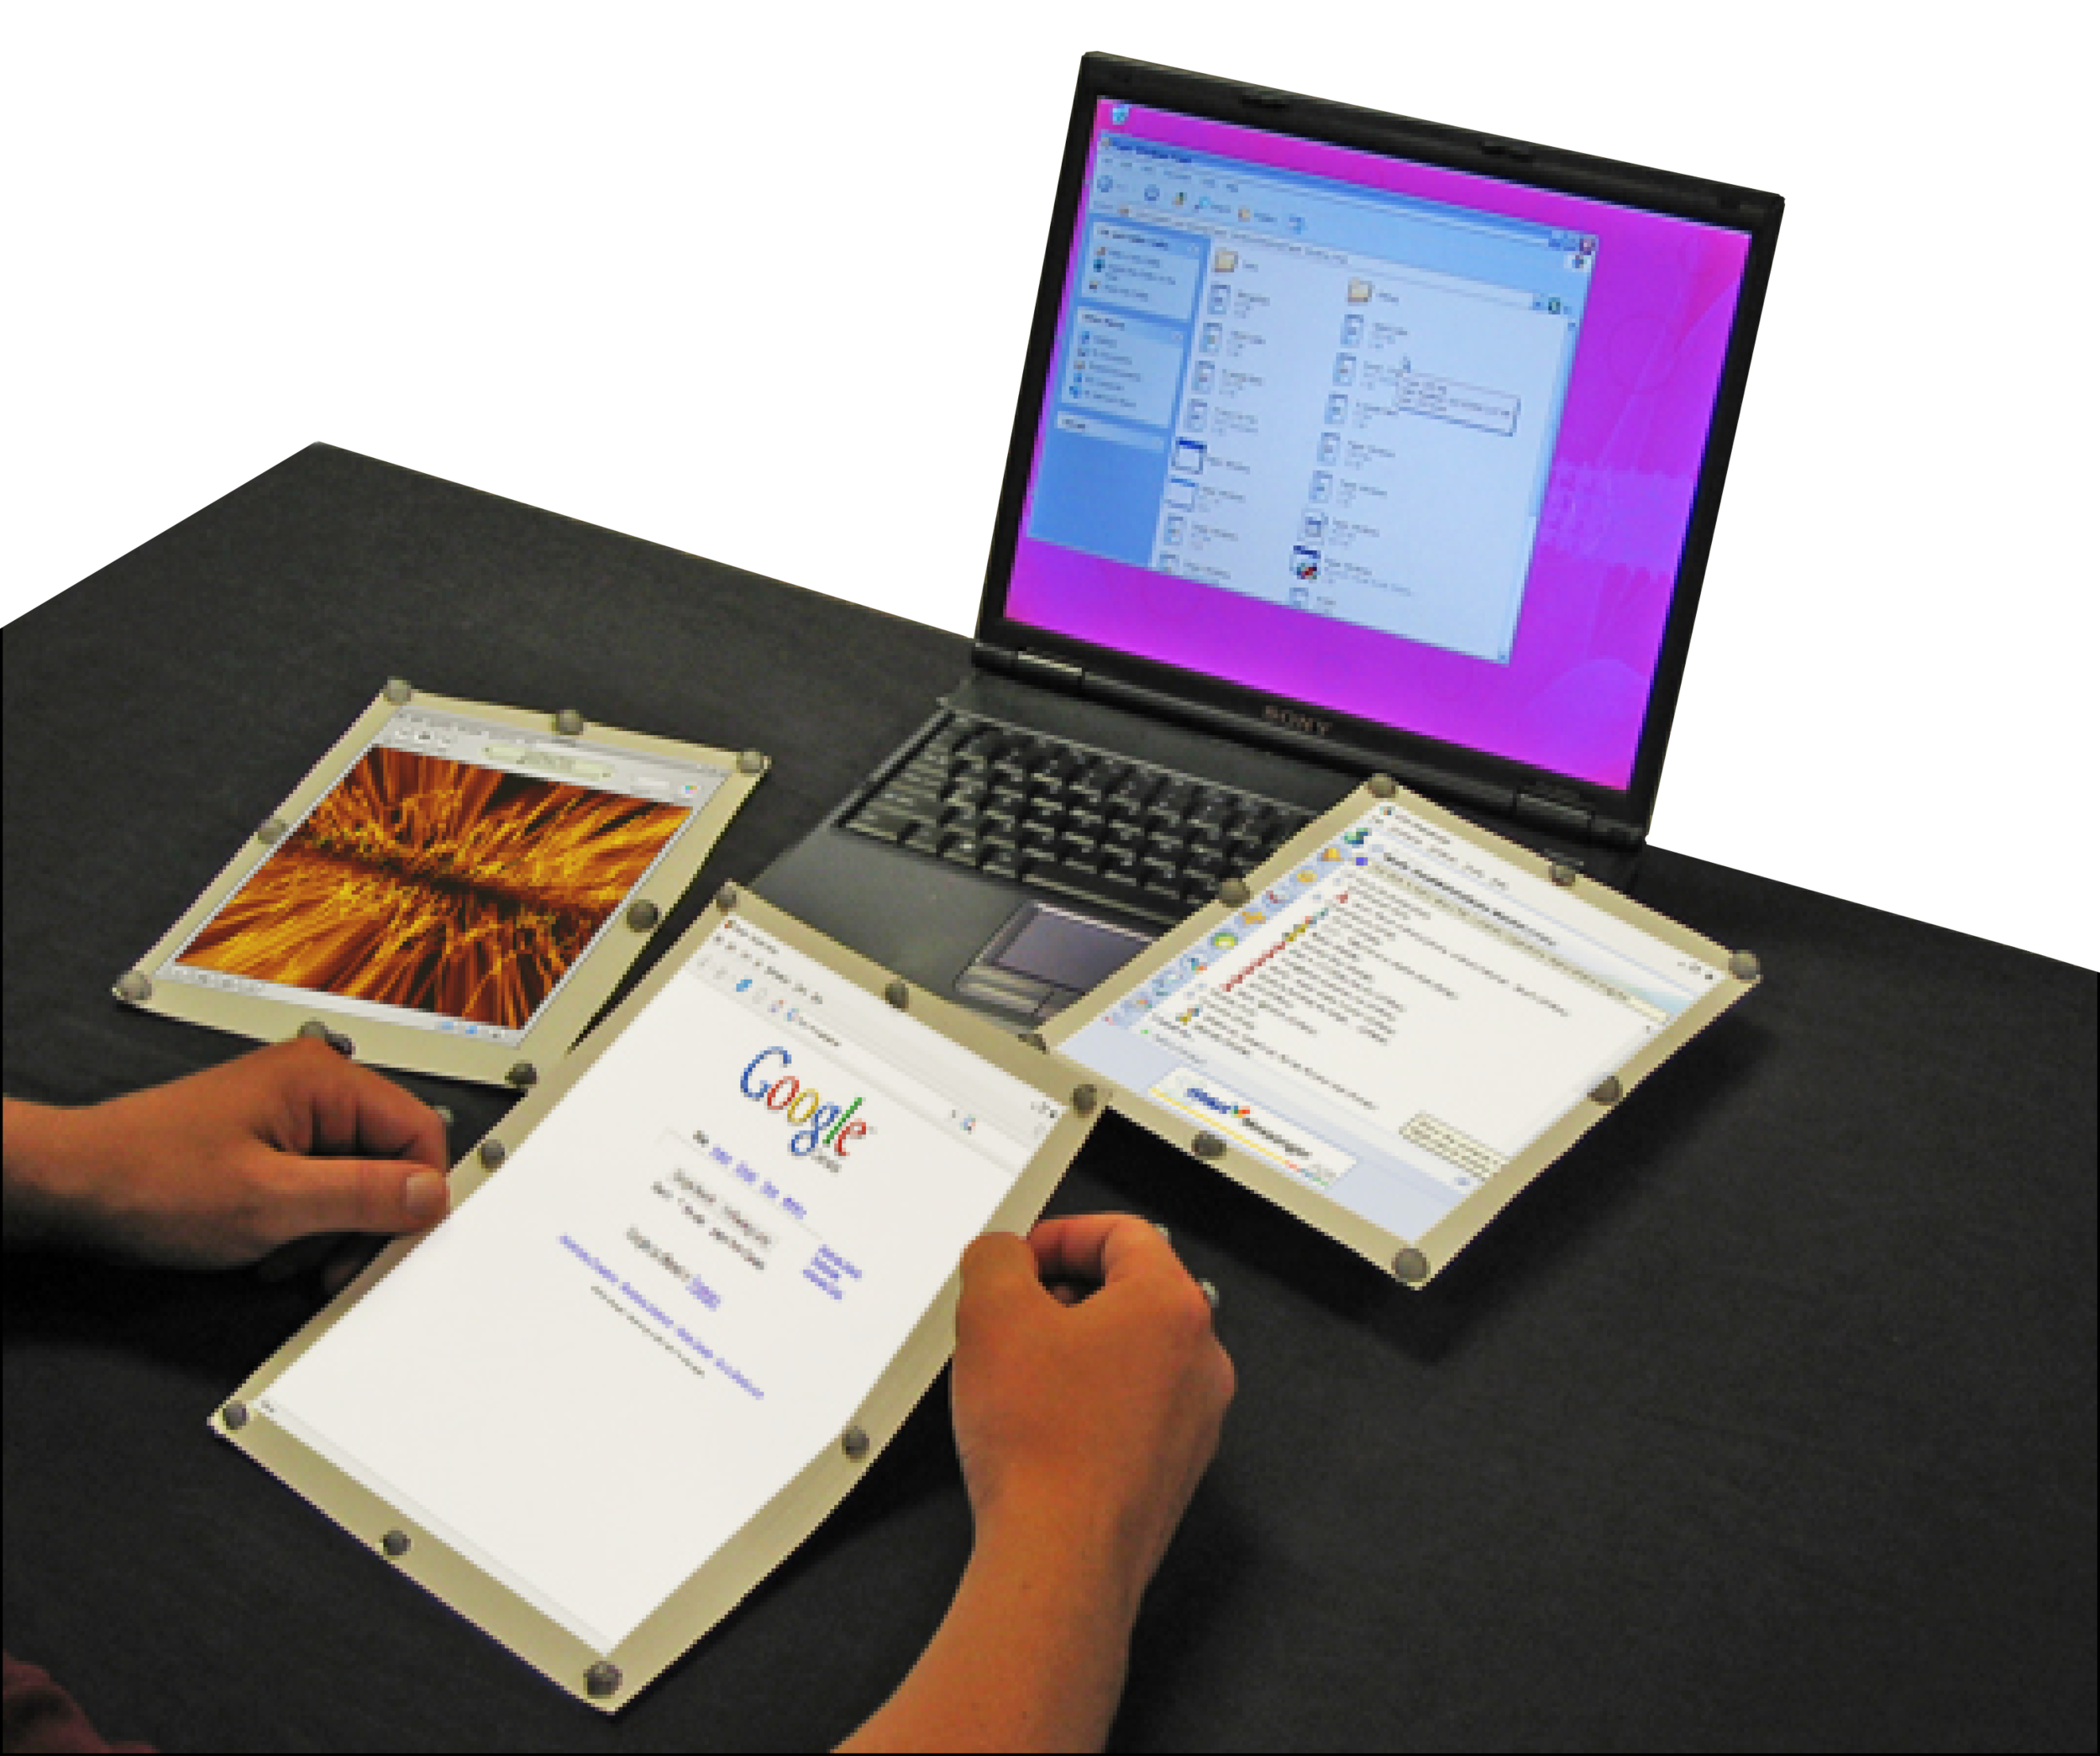 paperwindows (2005) first wireless, flexible paper computer